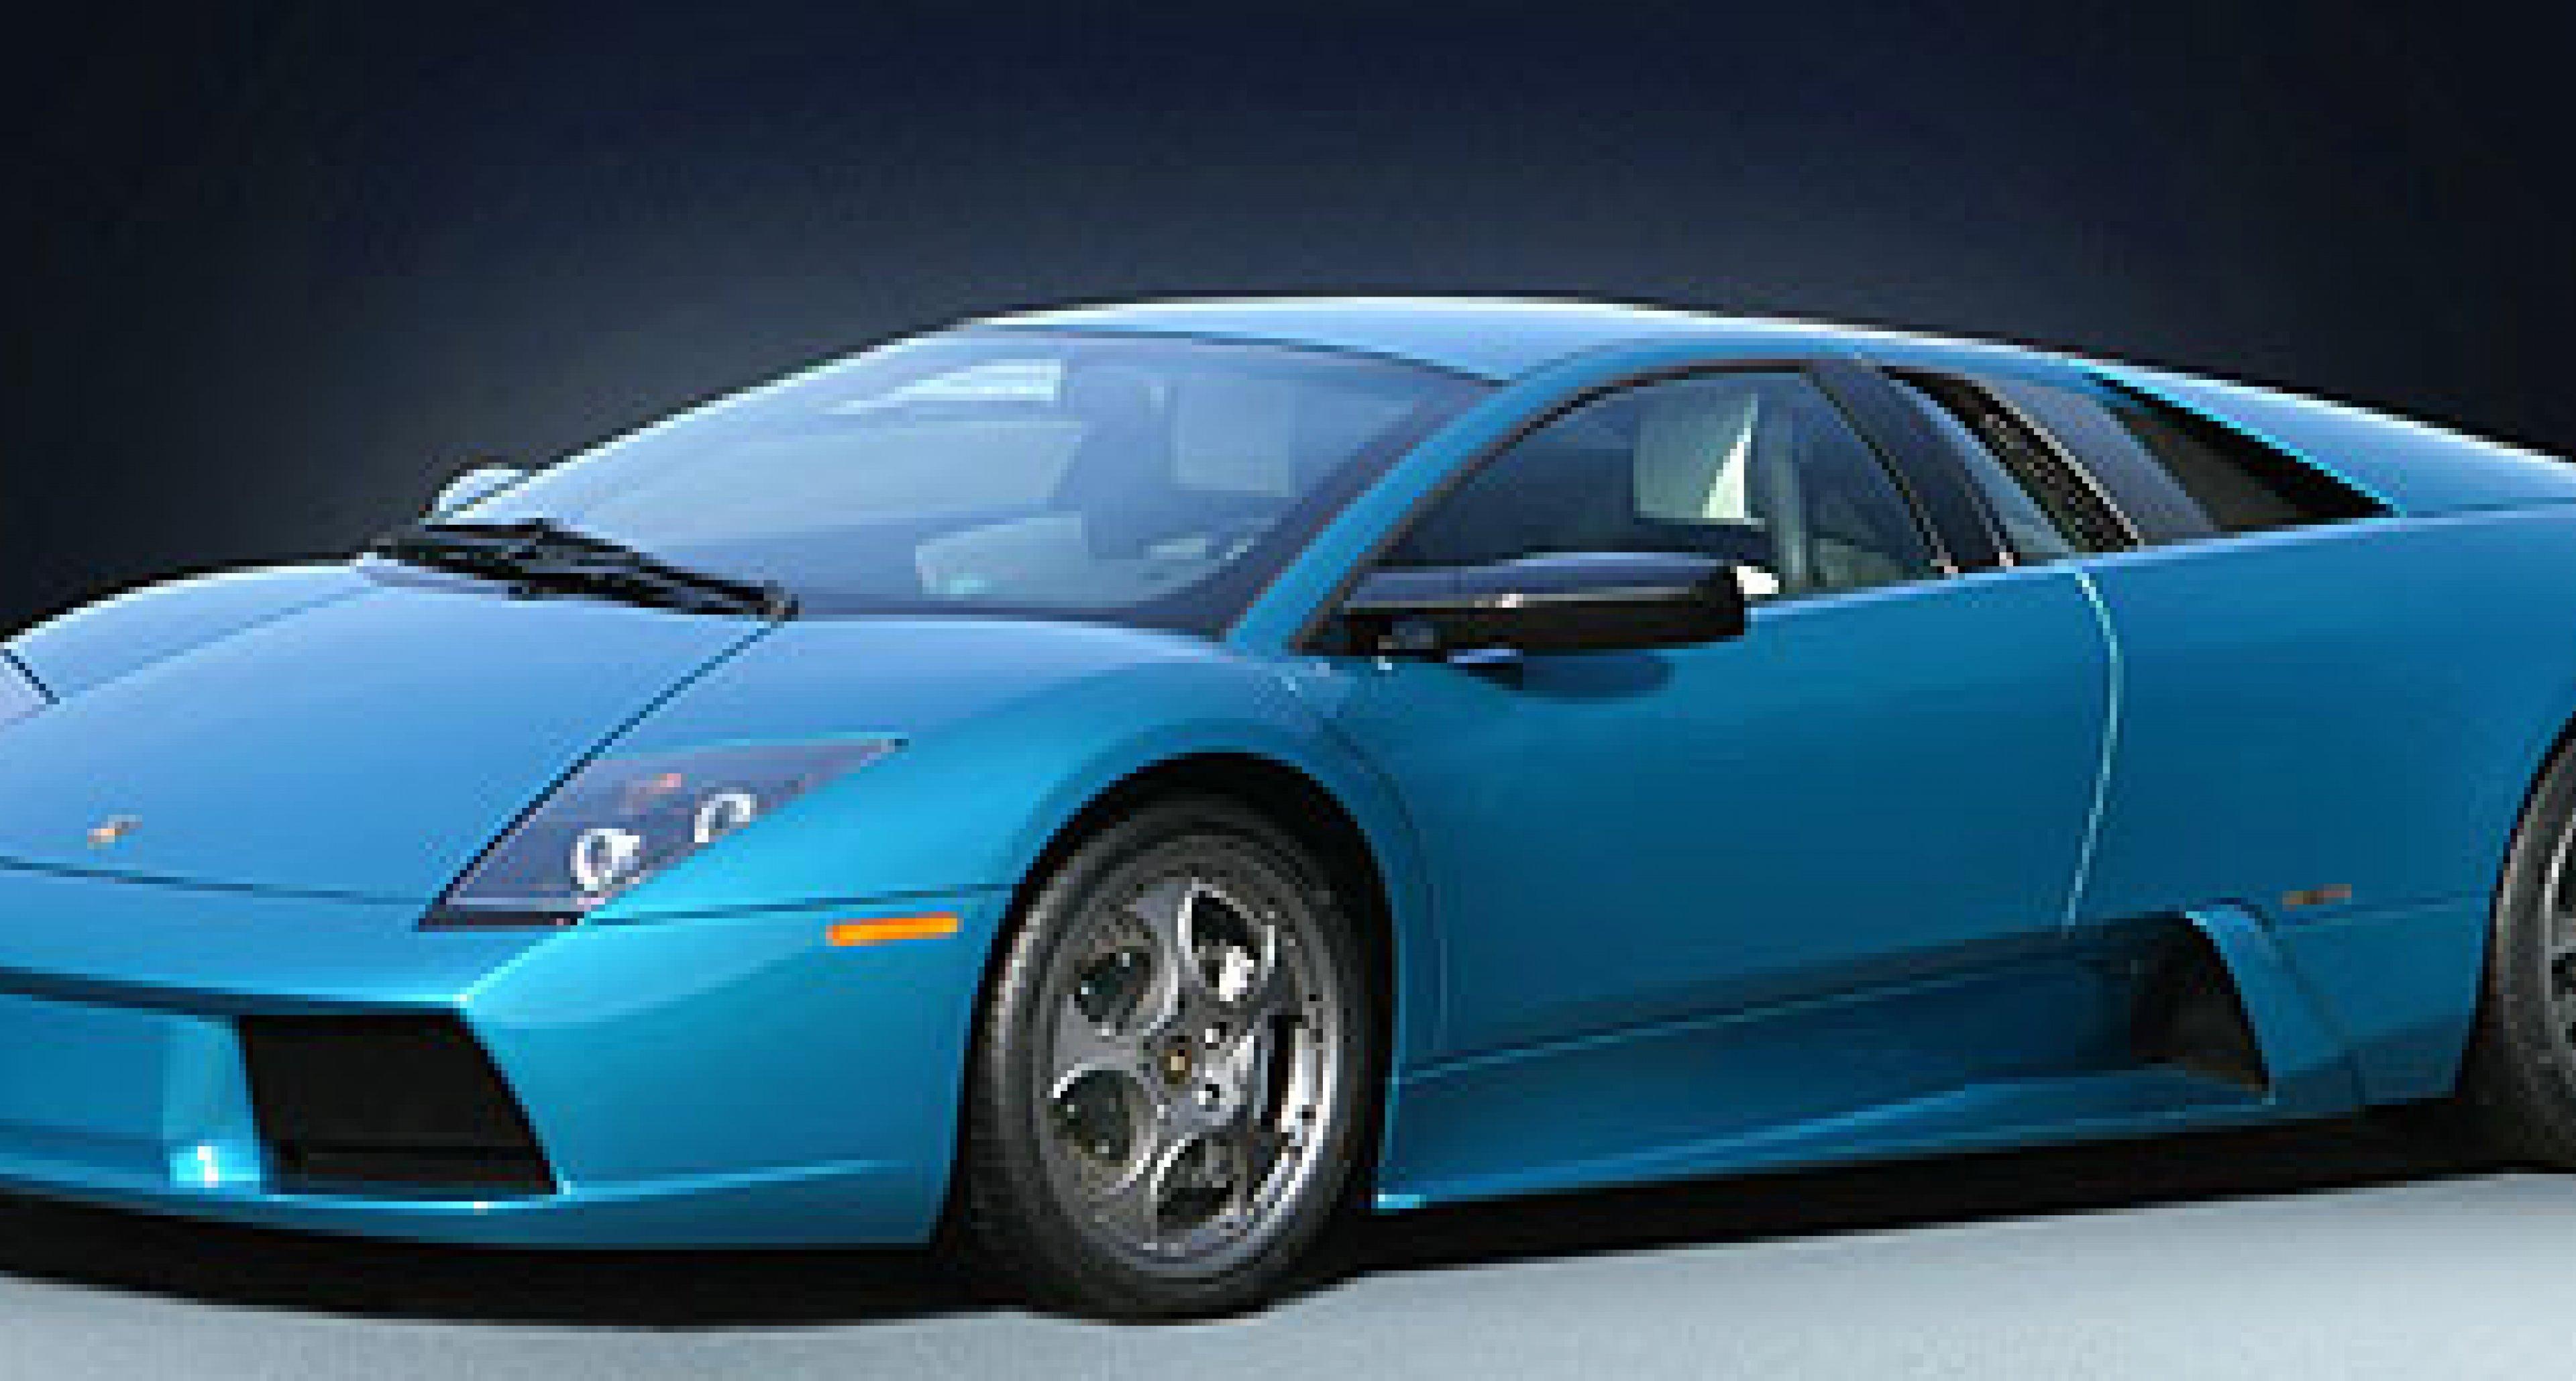 Lamborghini Murciélago: Limitierte Sonderserie zum 40. Jubiläum